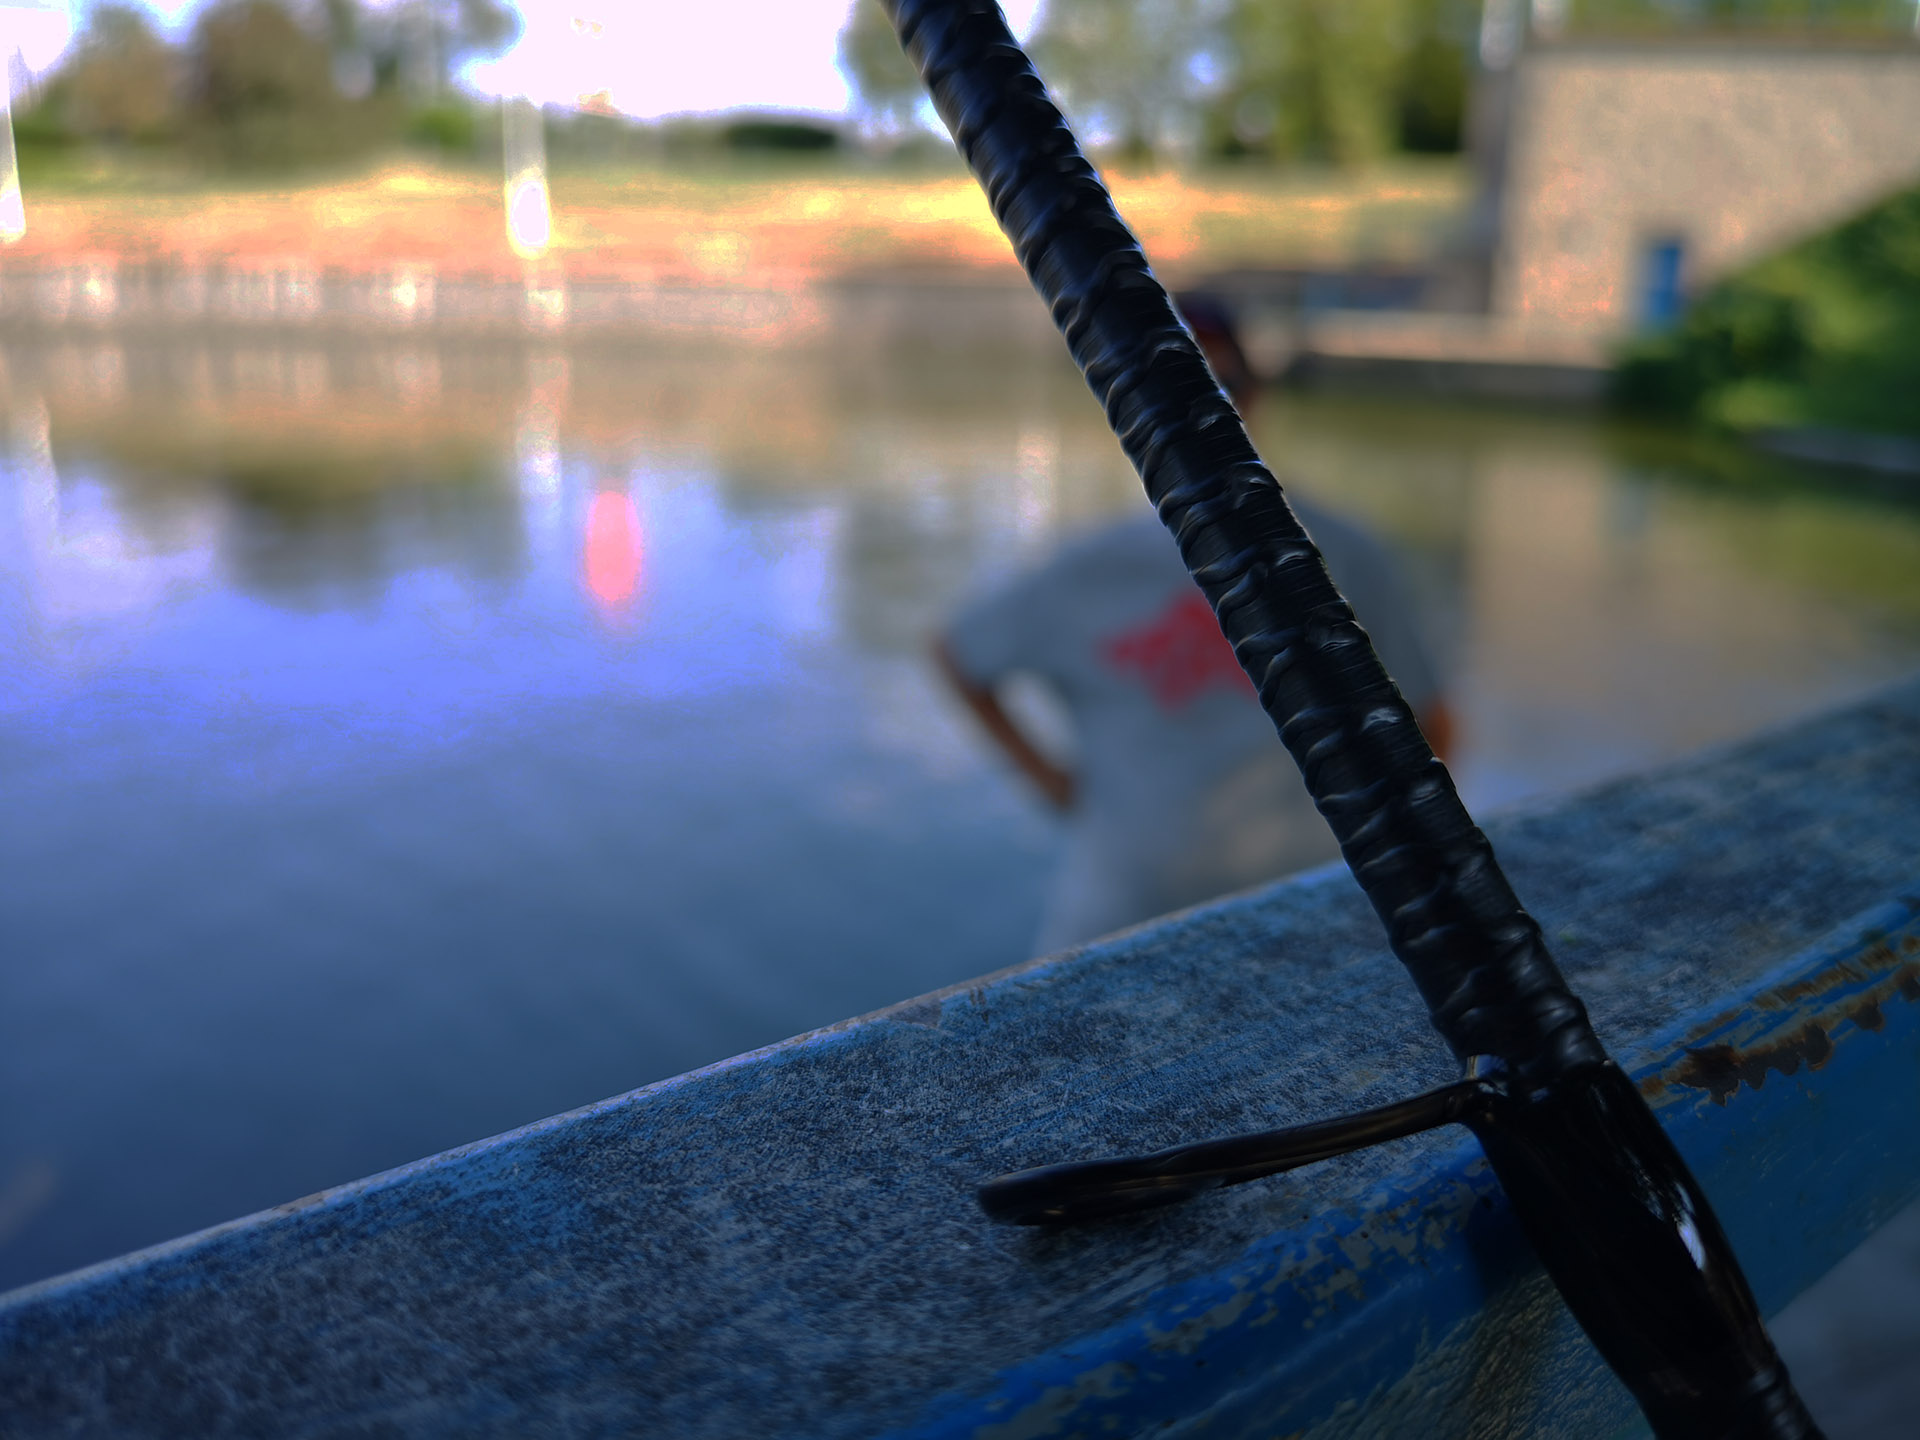 lanseta echipament de pescuit la salau